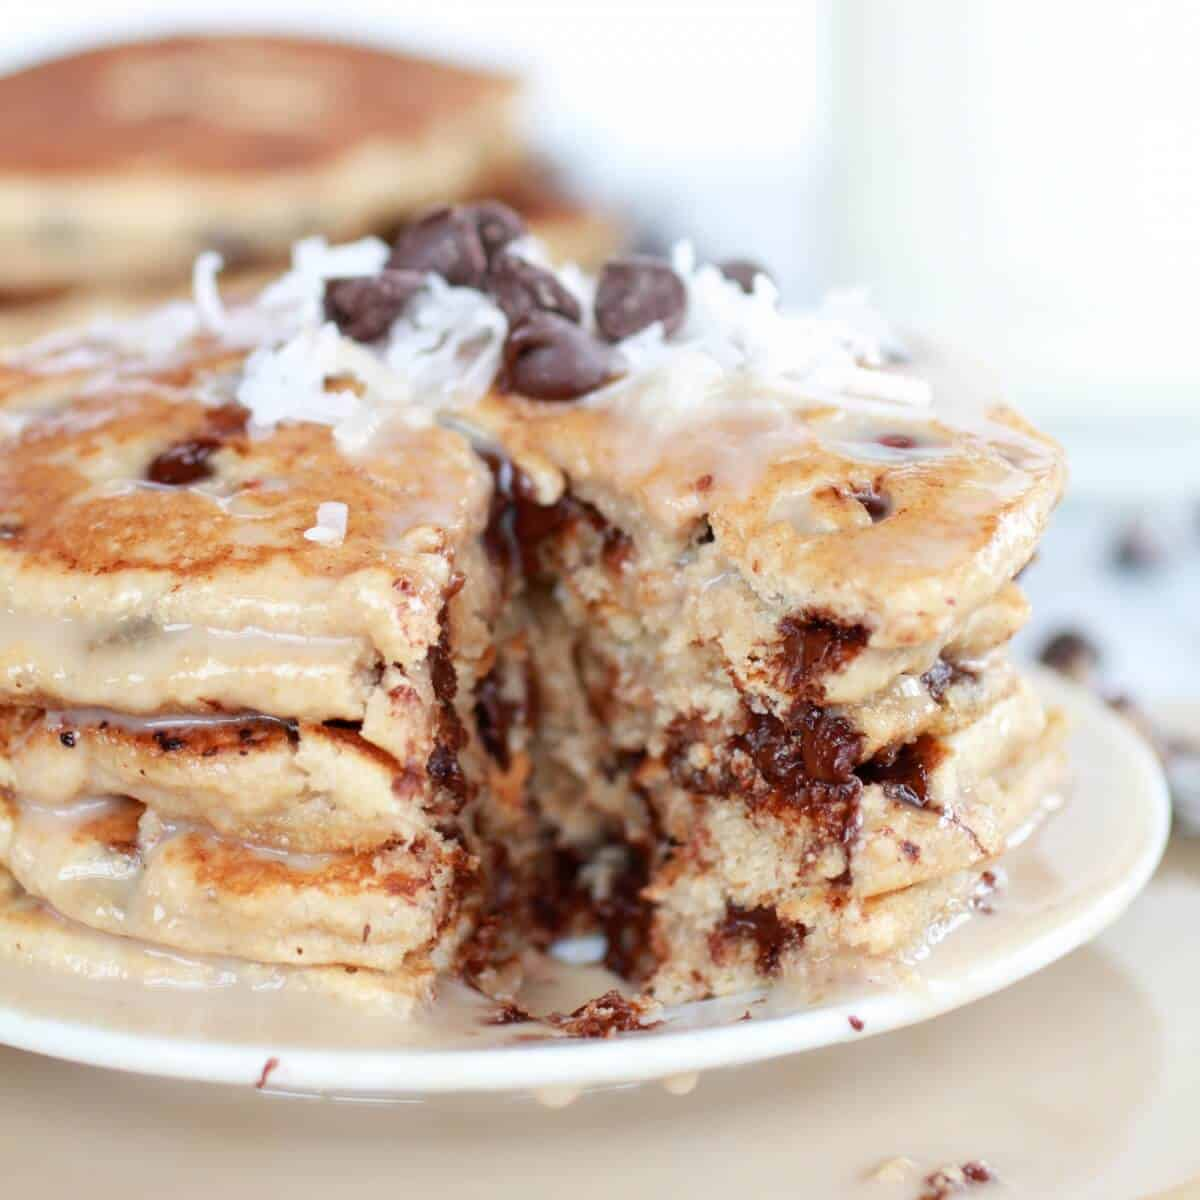 Recipe Chocolate Banana Bread Using Syrup